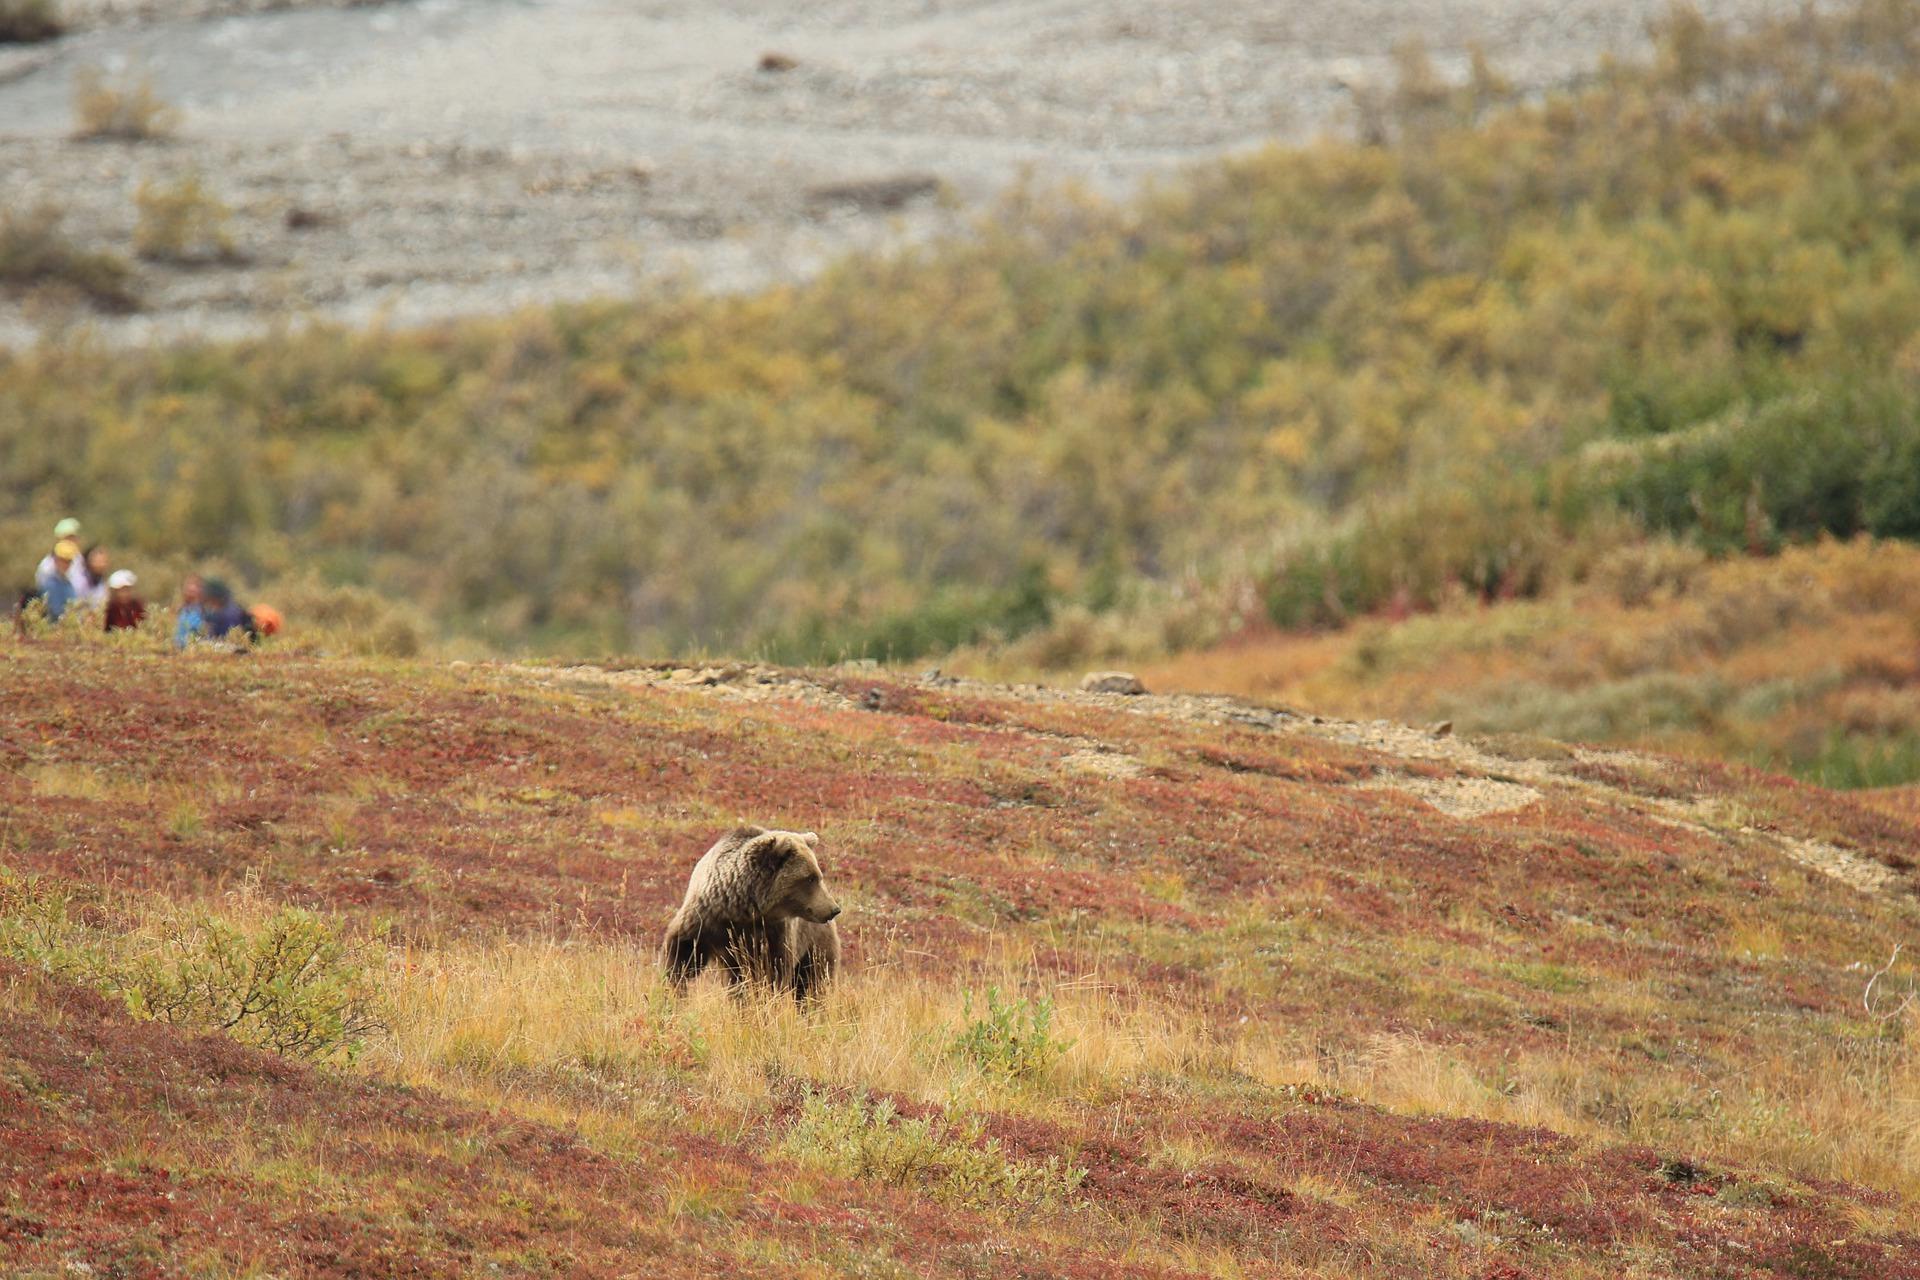 A bear walks along a ridge as photographers observe from a safe distance.